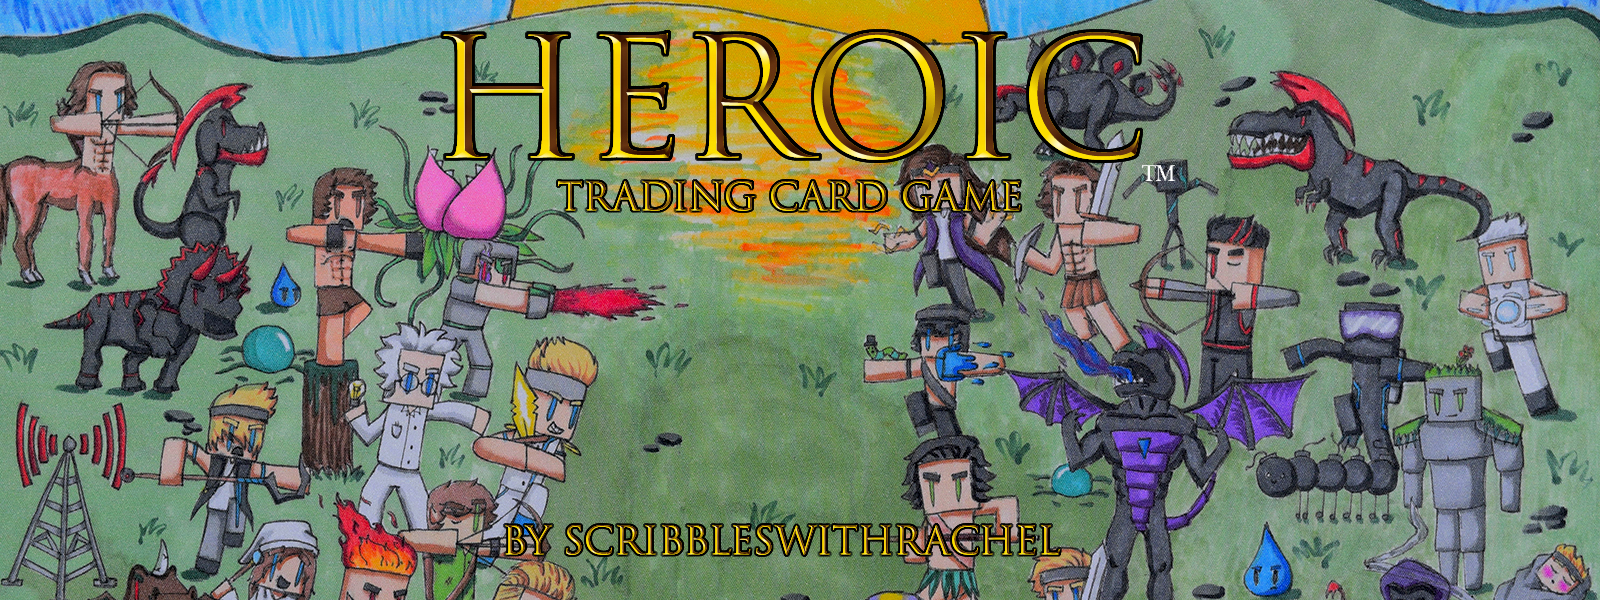 heroic set 1 the battle begins booster pack 10 cards